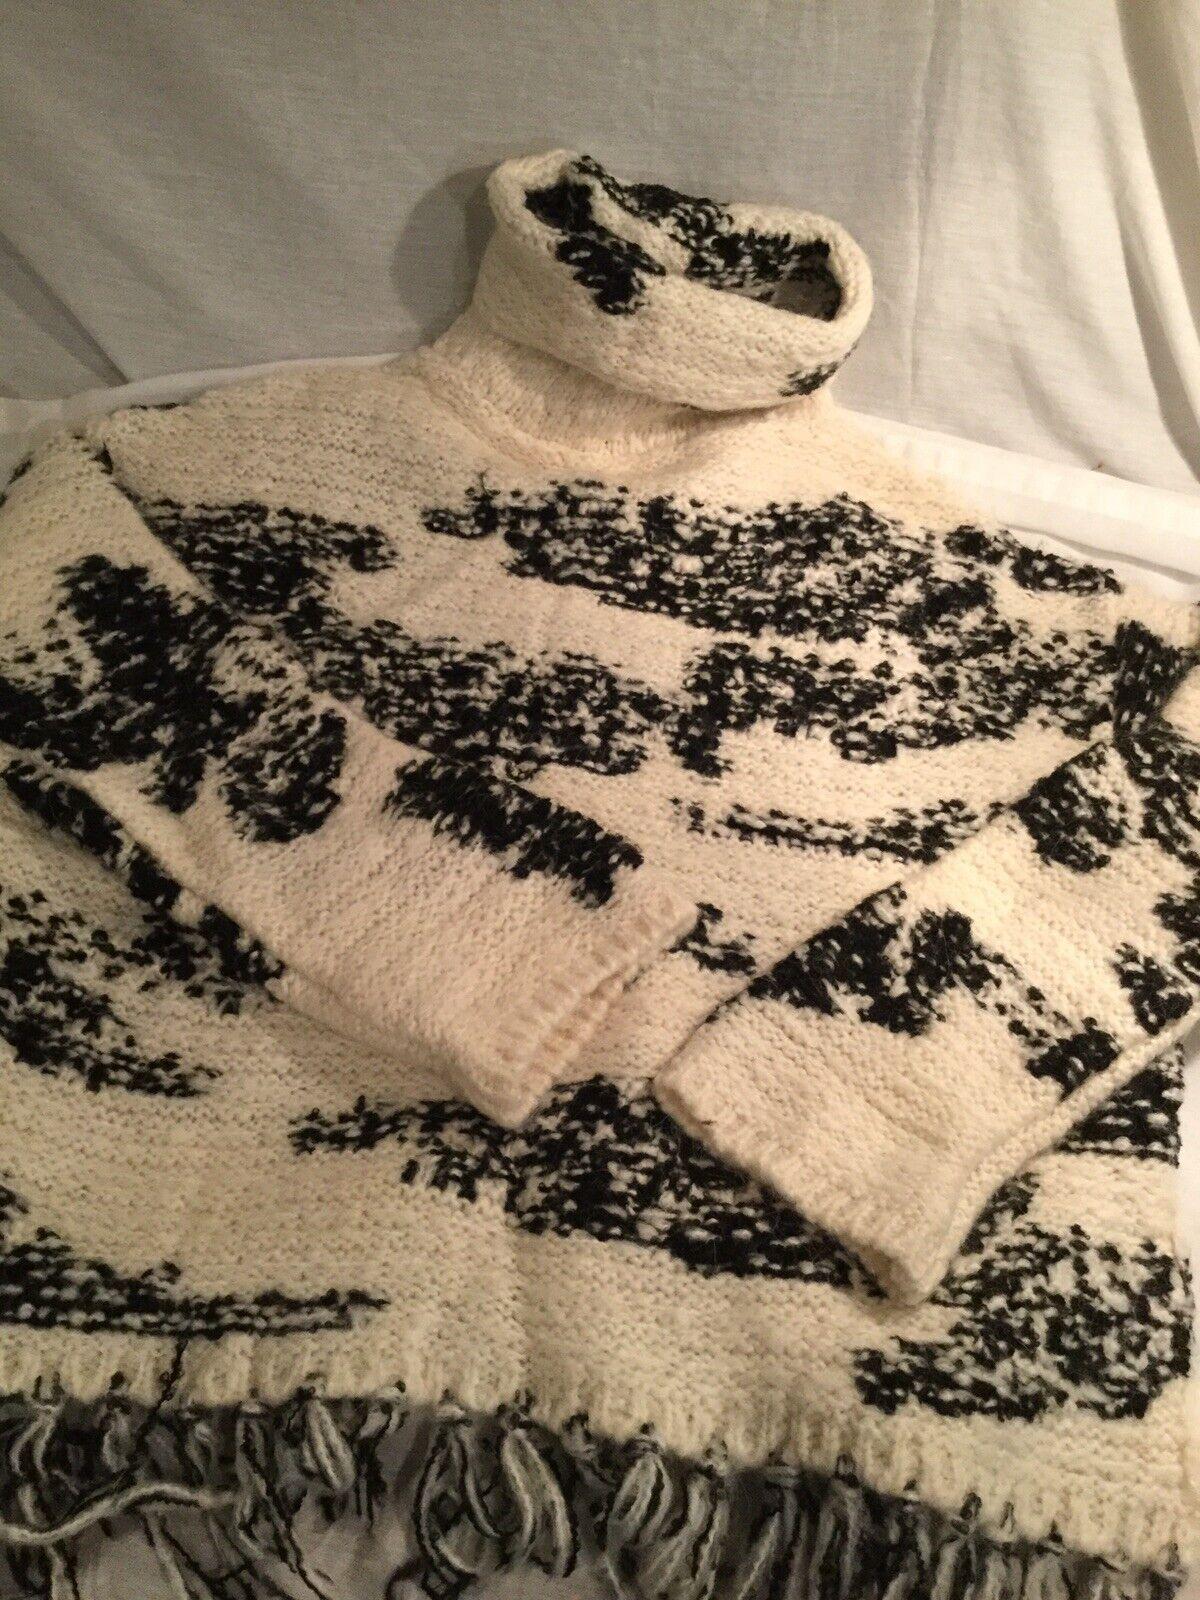 NWOT NWOT NWOT Zara Fringed Sweater M 21687b